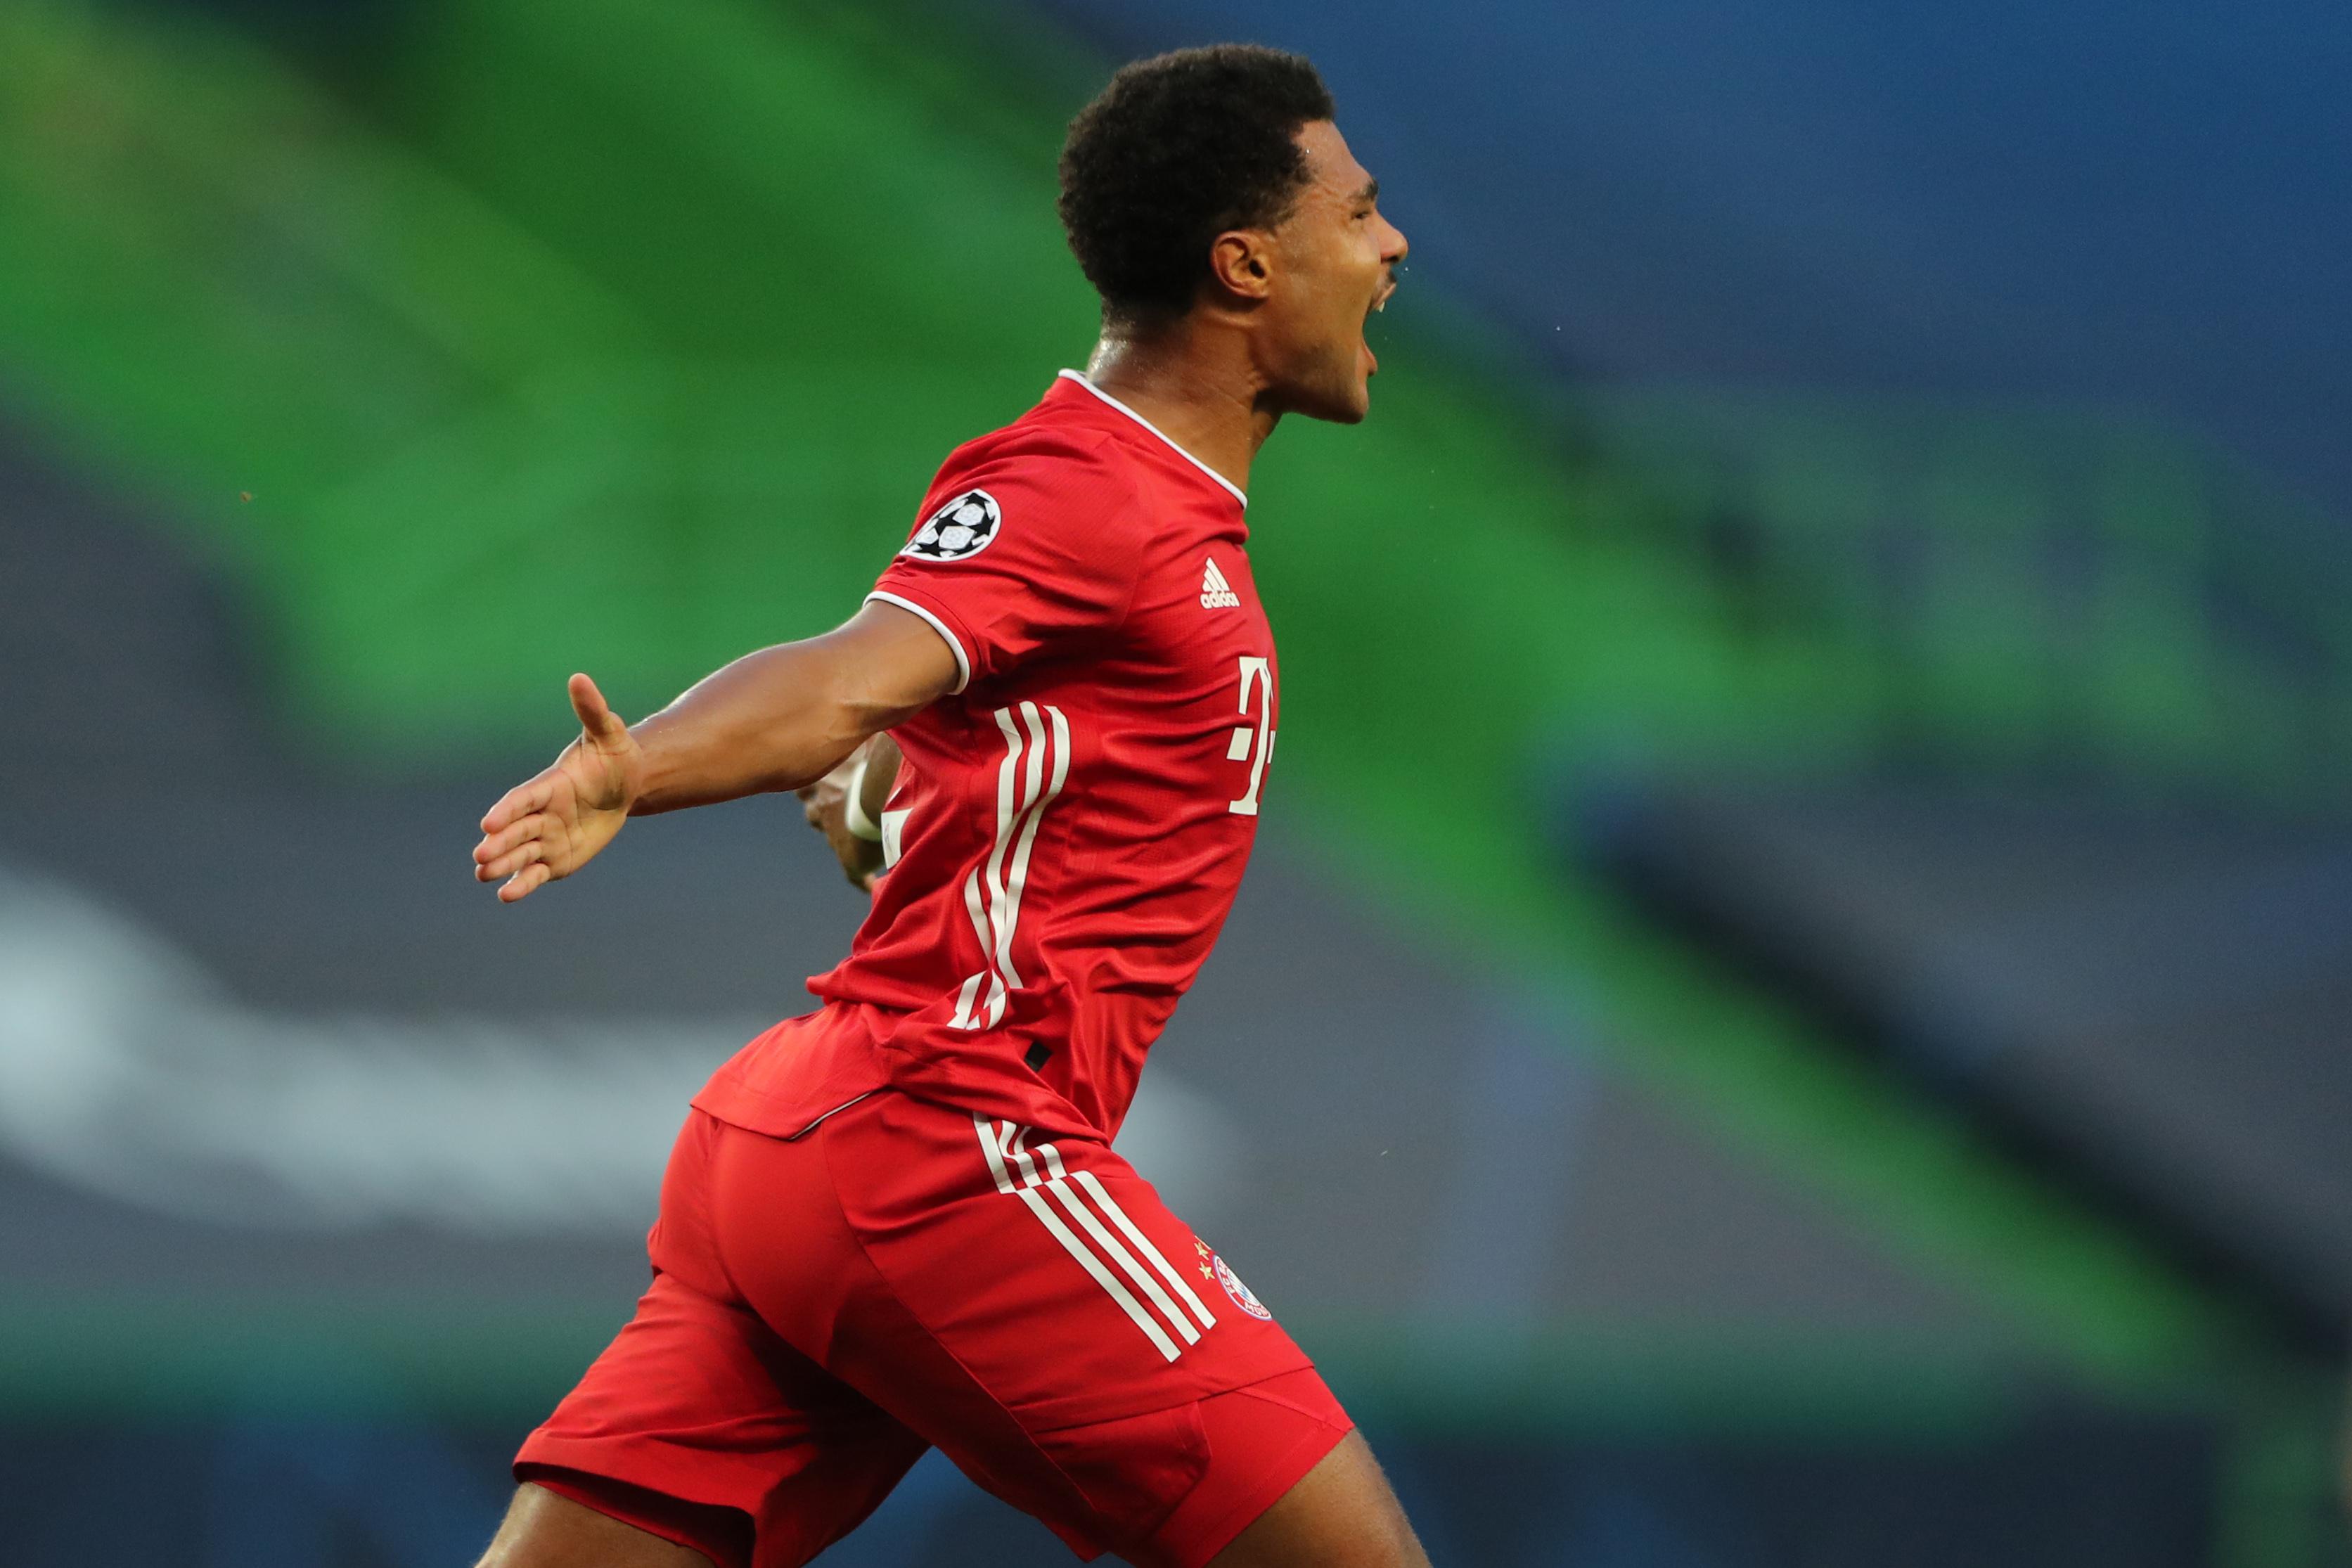 Bayern enfrentará al PSG en la final de Champions – CNN